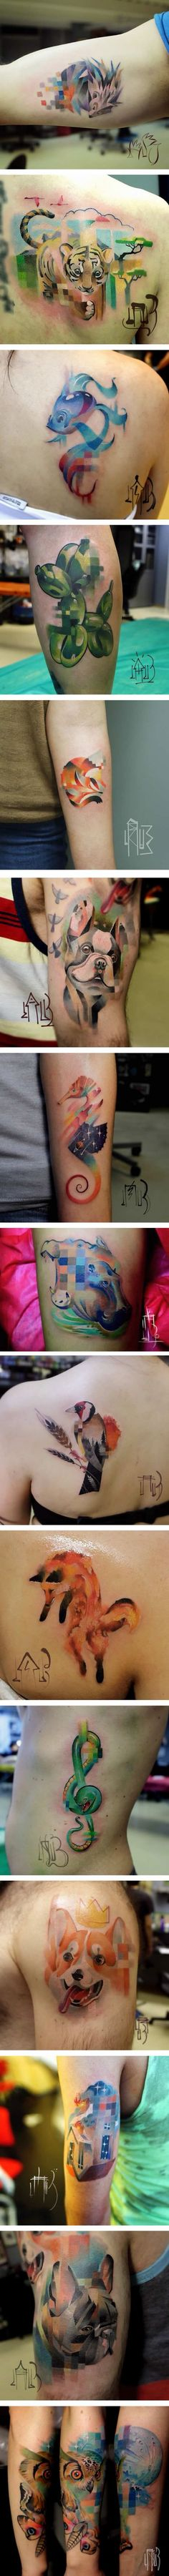 Awesome Animal Tattoos With Digital Pixel Glitches (By Lesha Lauz)